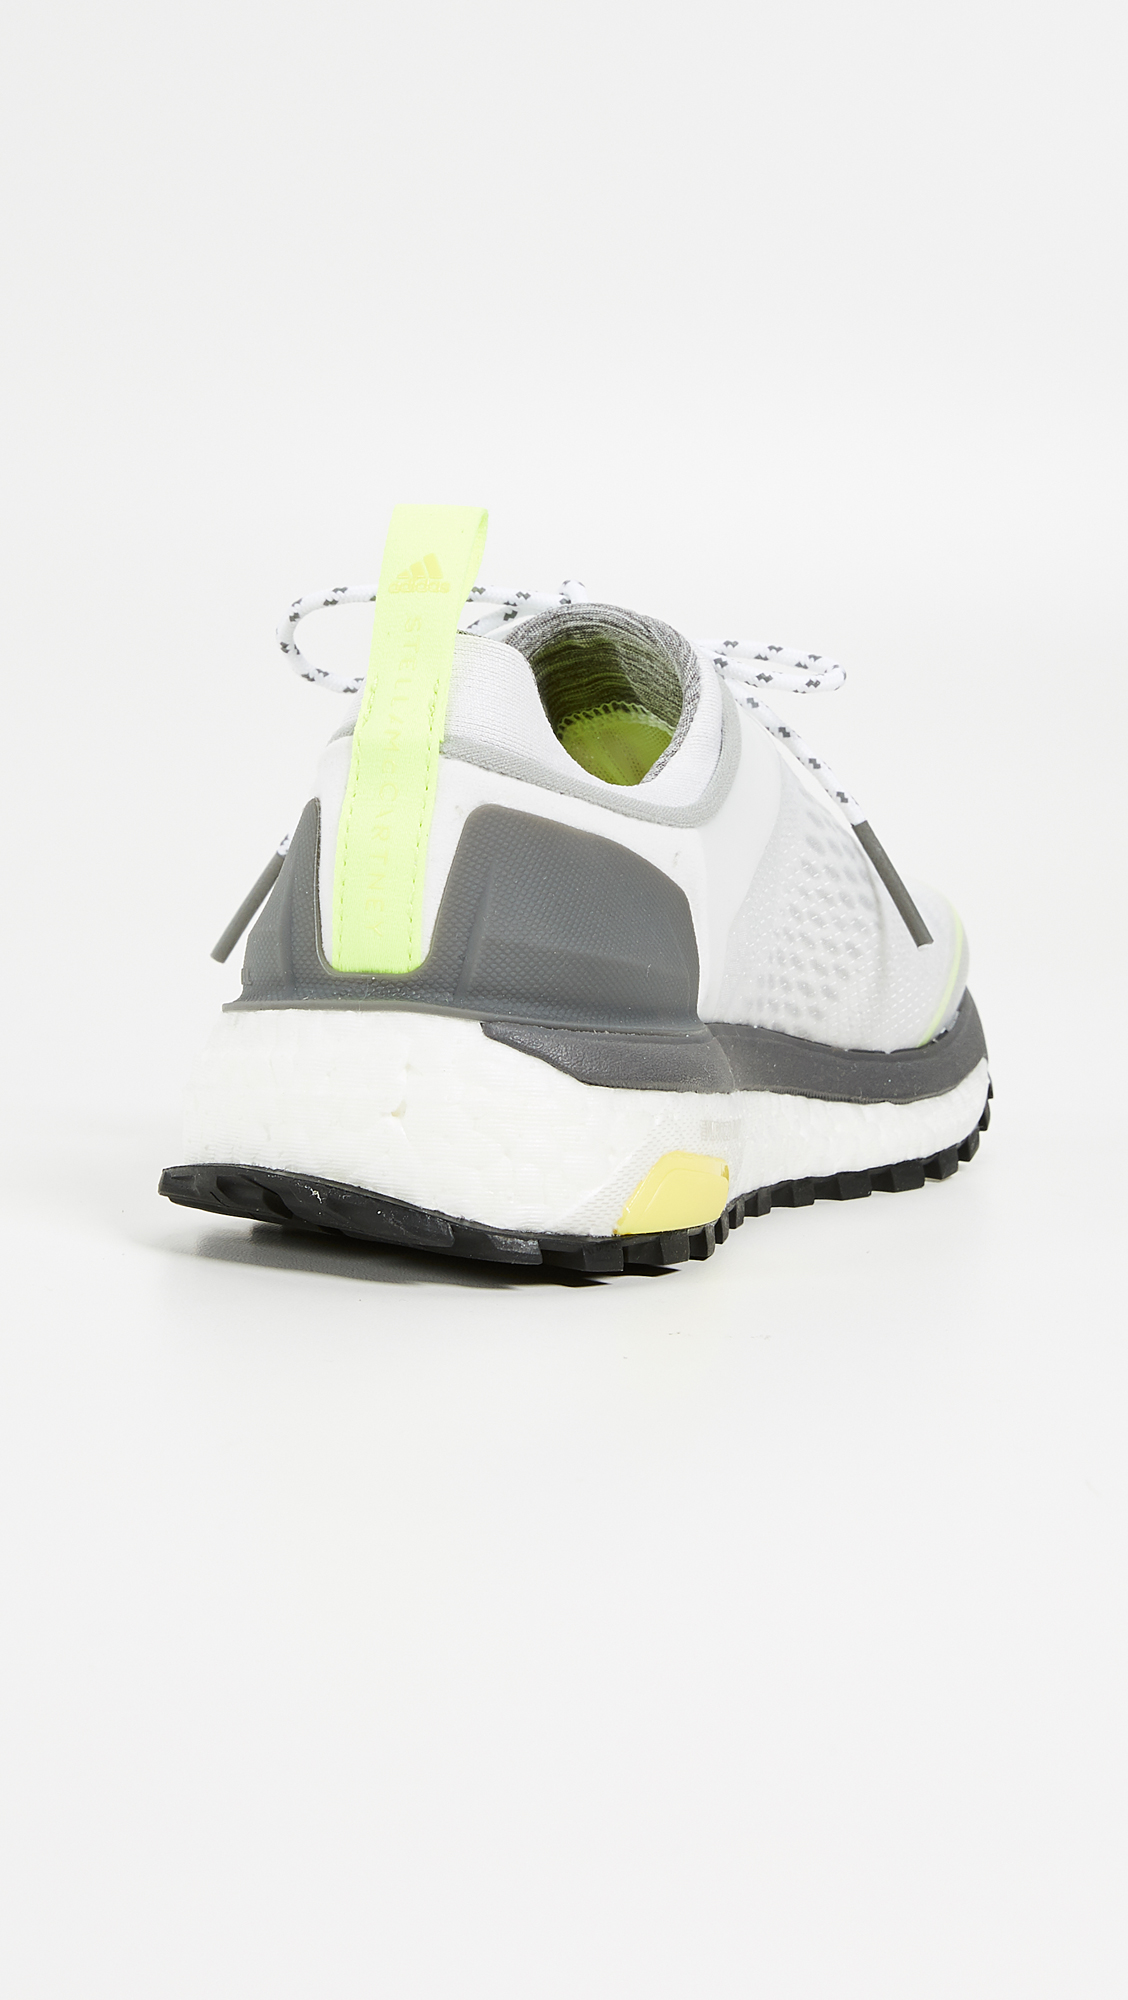 649a4342e6f89 adidas by Stella McCartney Supernova Trail Sneakers